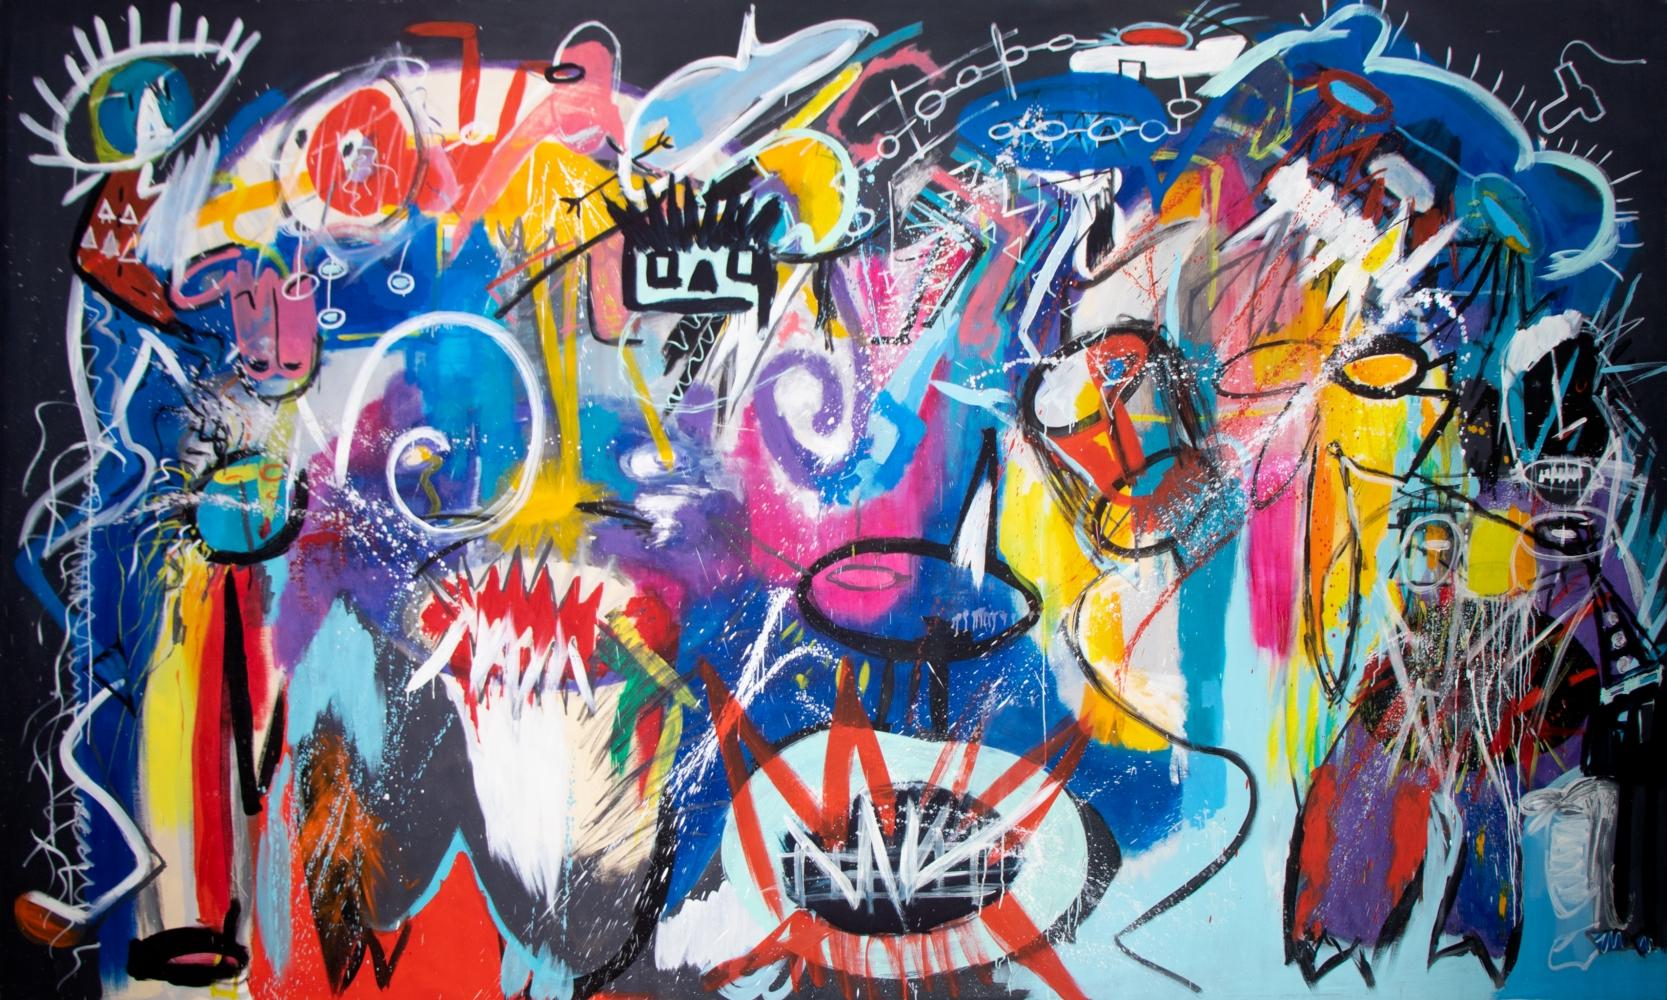 Fernanda Lavera, Los Gatos Rabiosos, 2012, Acrylic on canvas, 200 x 330 cm, Graffiti and Street Art for Sale at Manolis Projects Art Gallery, Miami, Fl